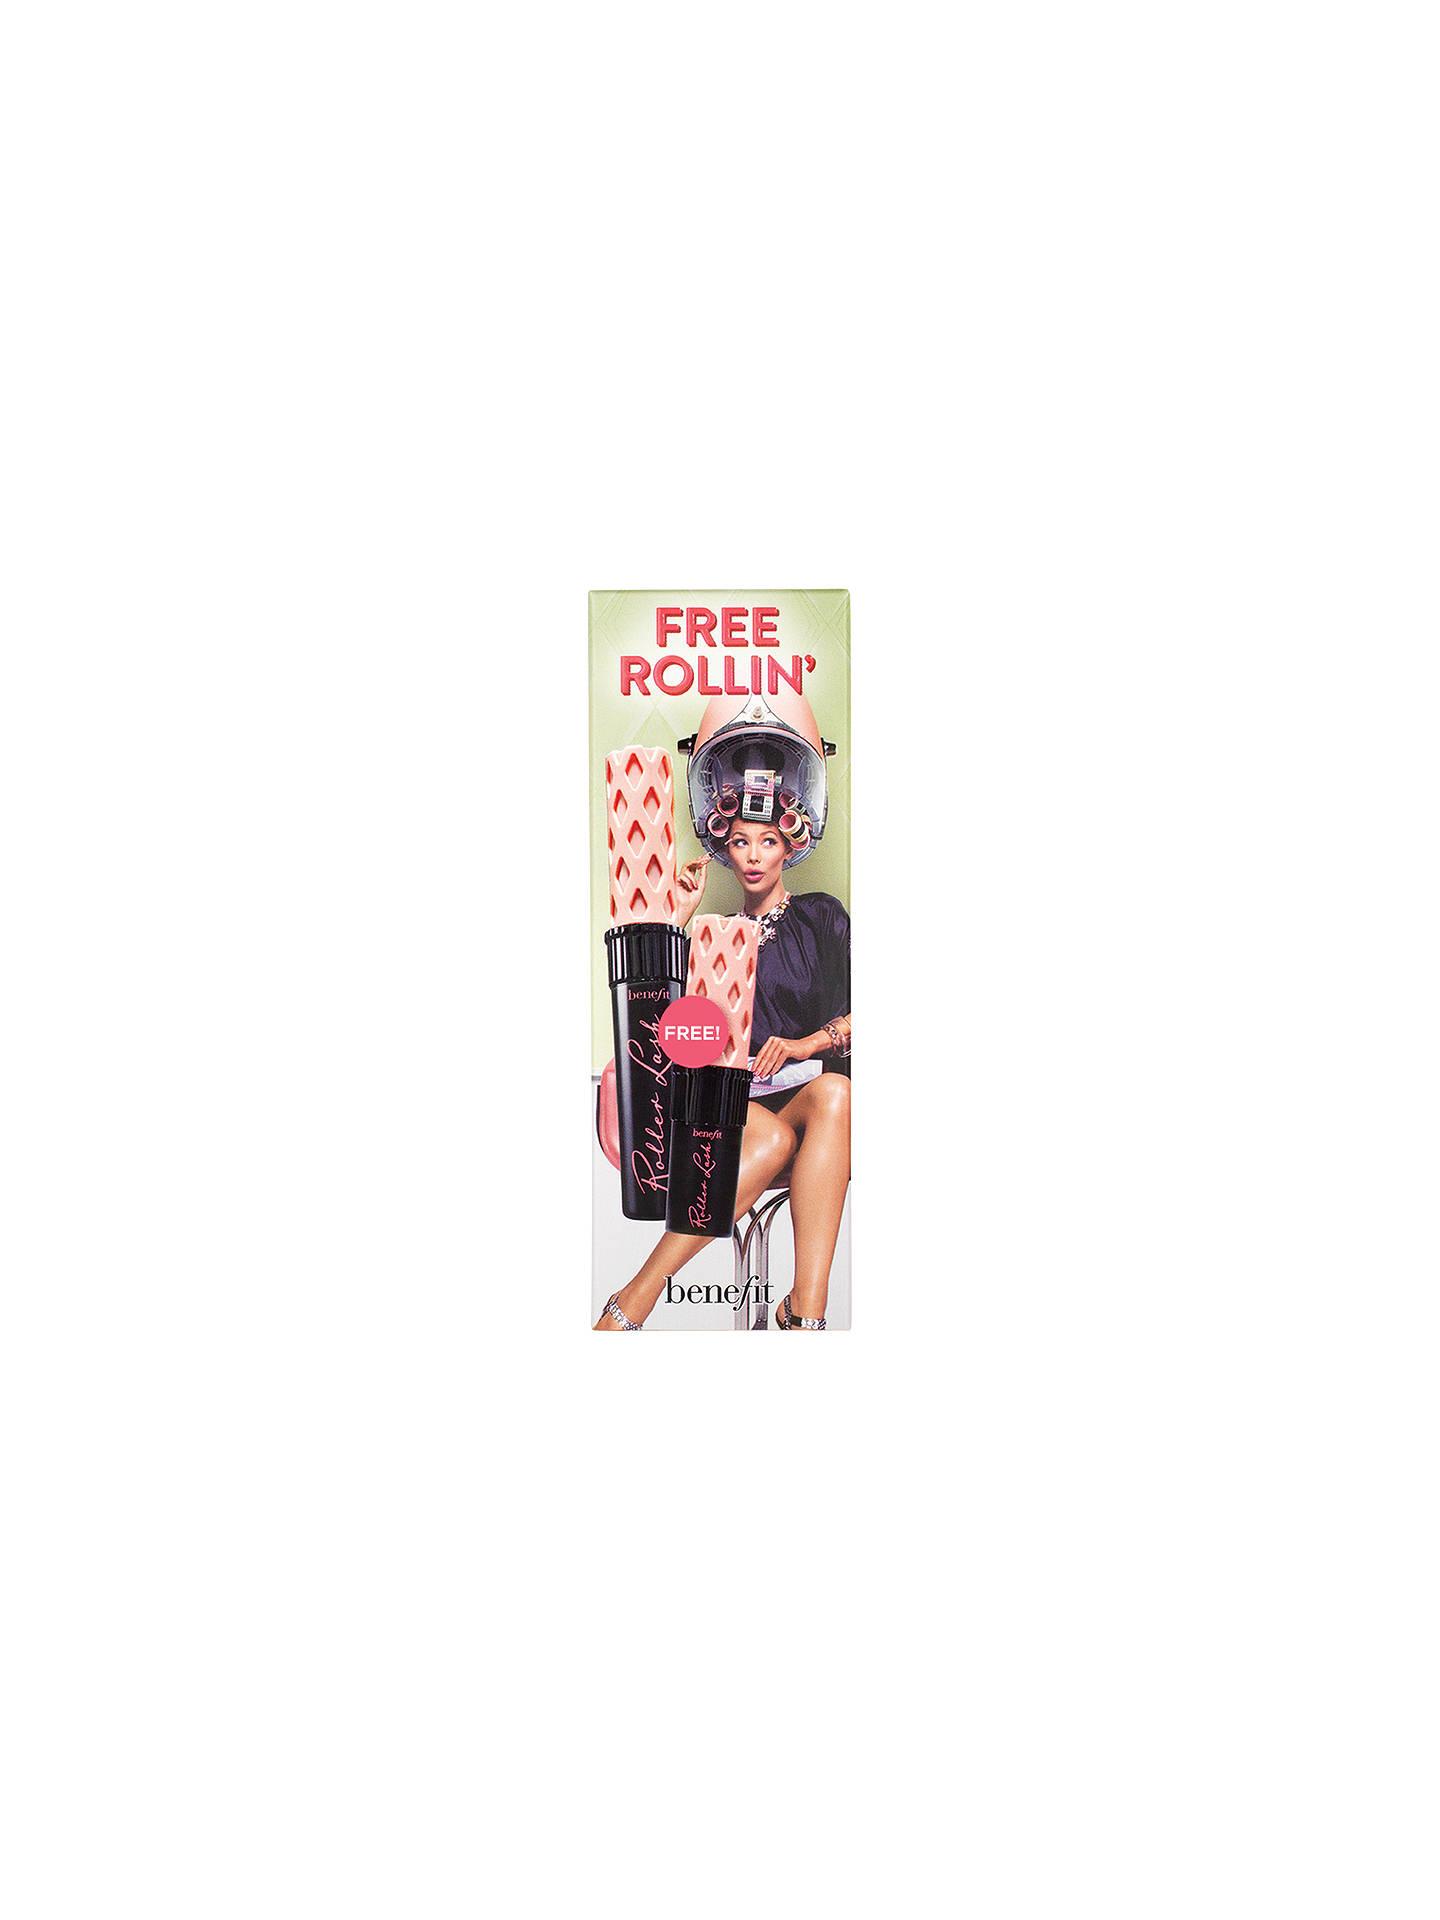 a9a9635b548 Buy Benefit Free Rollin Roller Lash Set Online at johnlewis.com ...